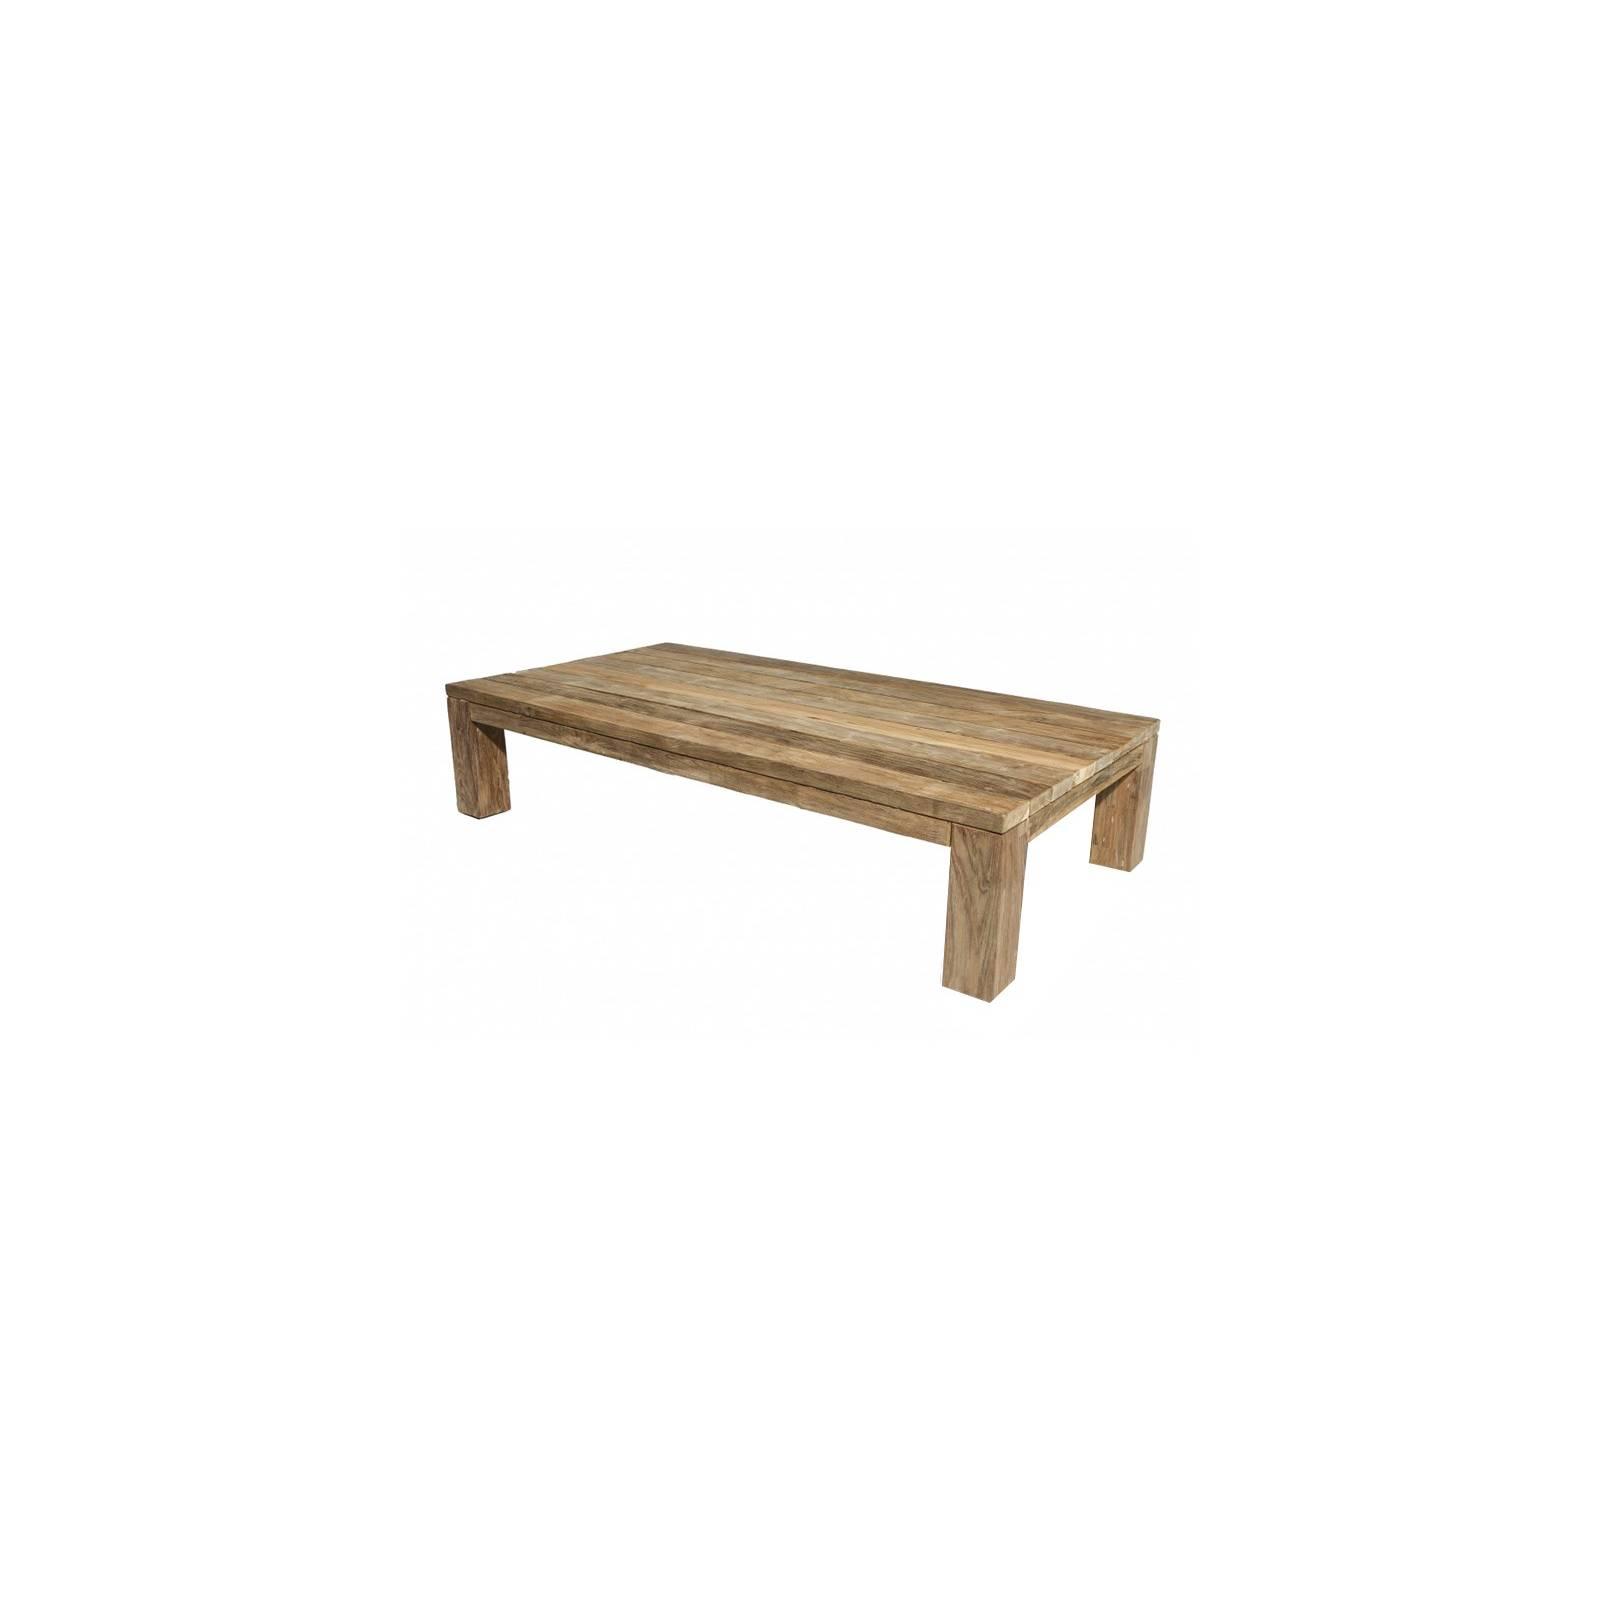 Table Basse Rectangulaire Taman Teck Recyclé - meuble de jardin